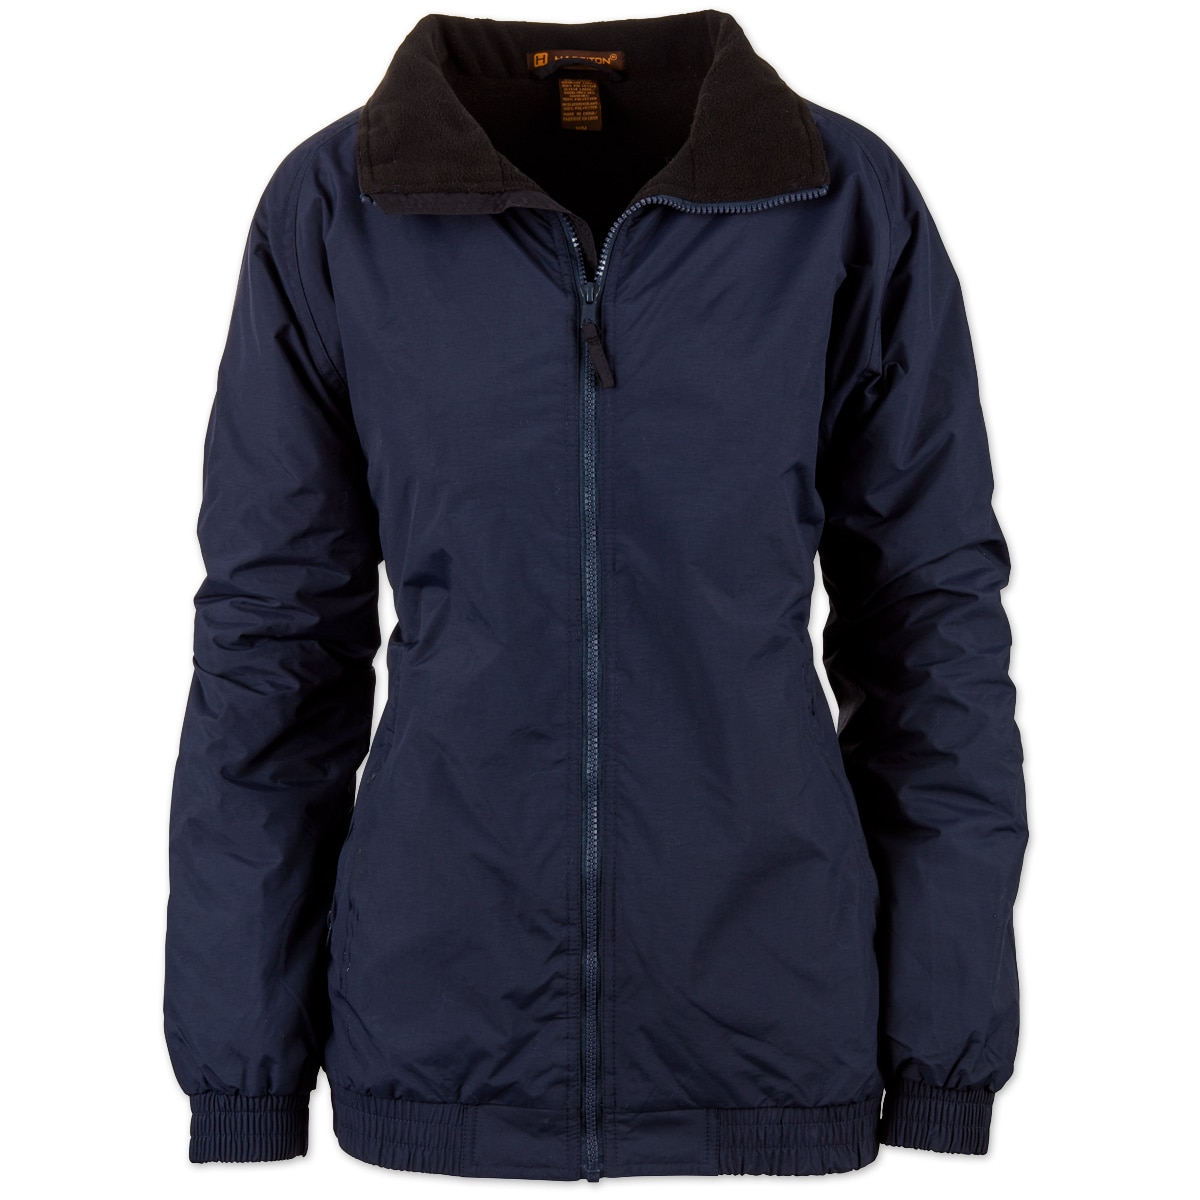 acca6dba43d Personalized Fleece Lined Nylon Jacket